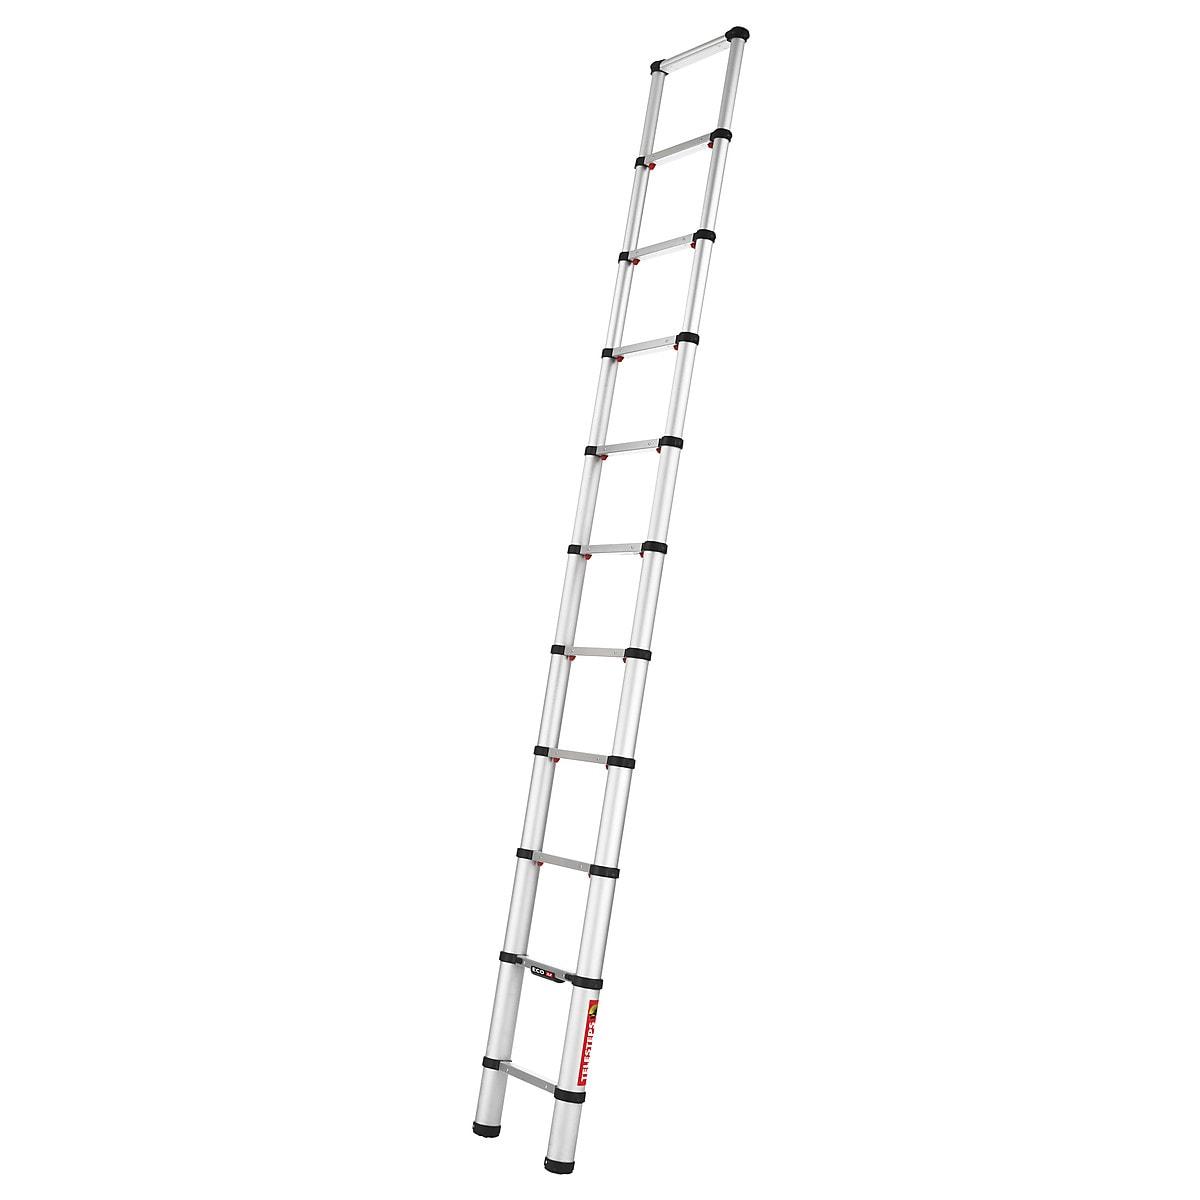 Teleskopleiter Telesteps Eco Line 3,2 m